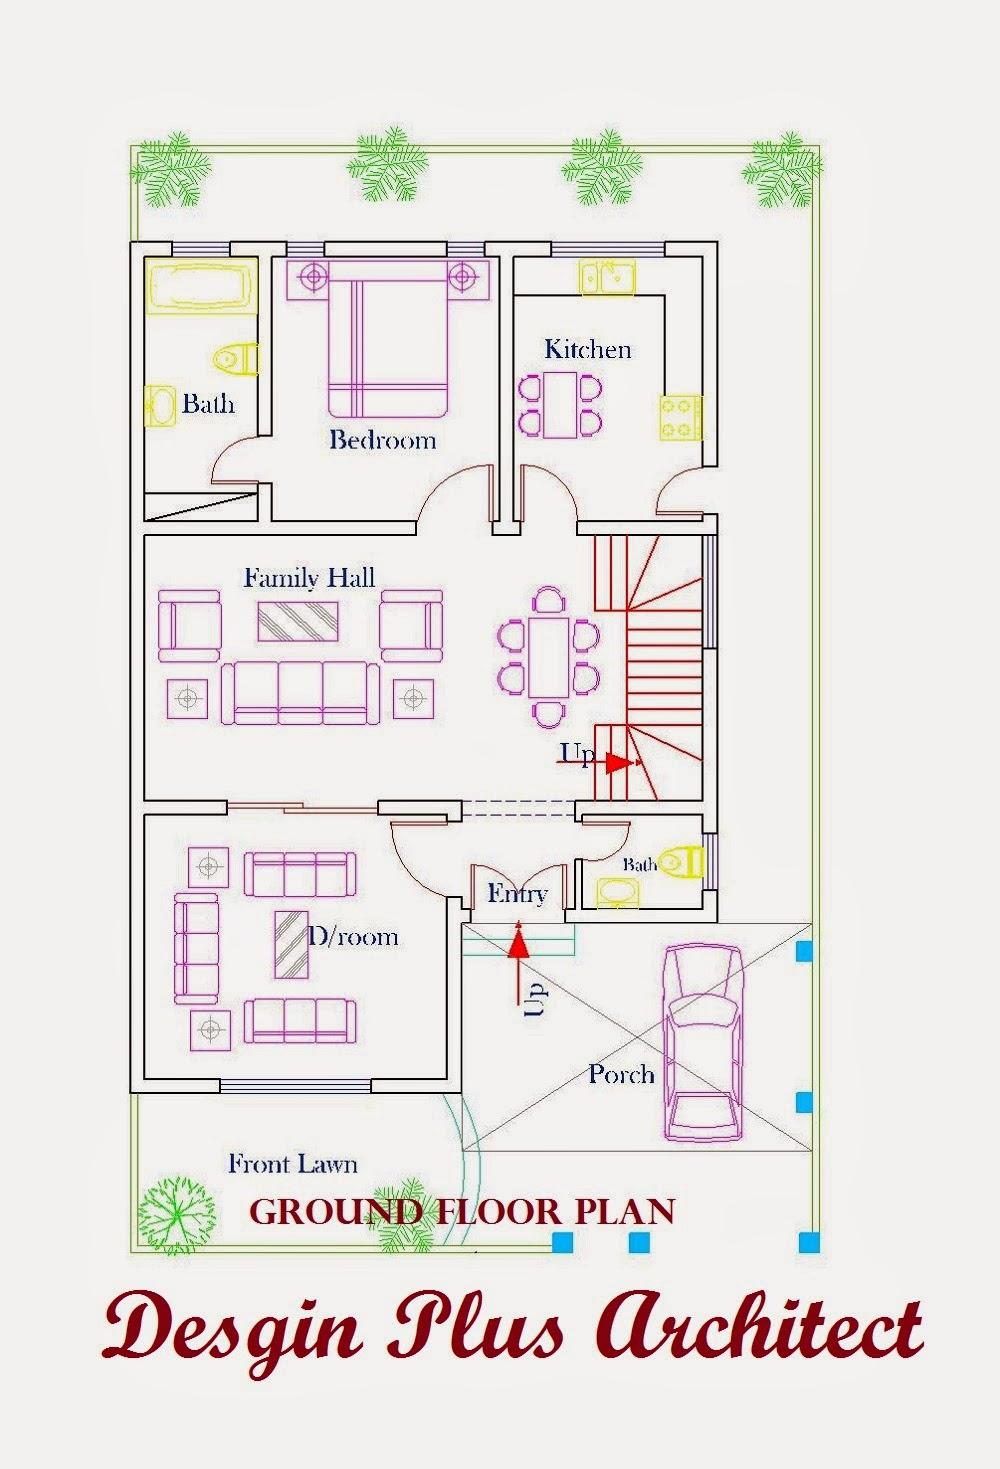 Home Plans In Pakistan, Home Decor, Architect Designer